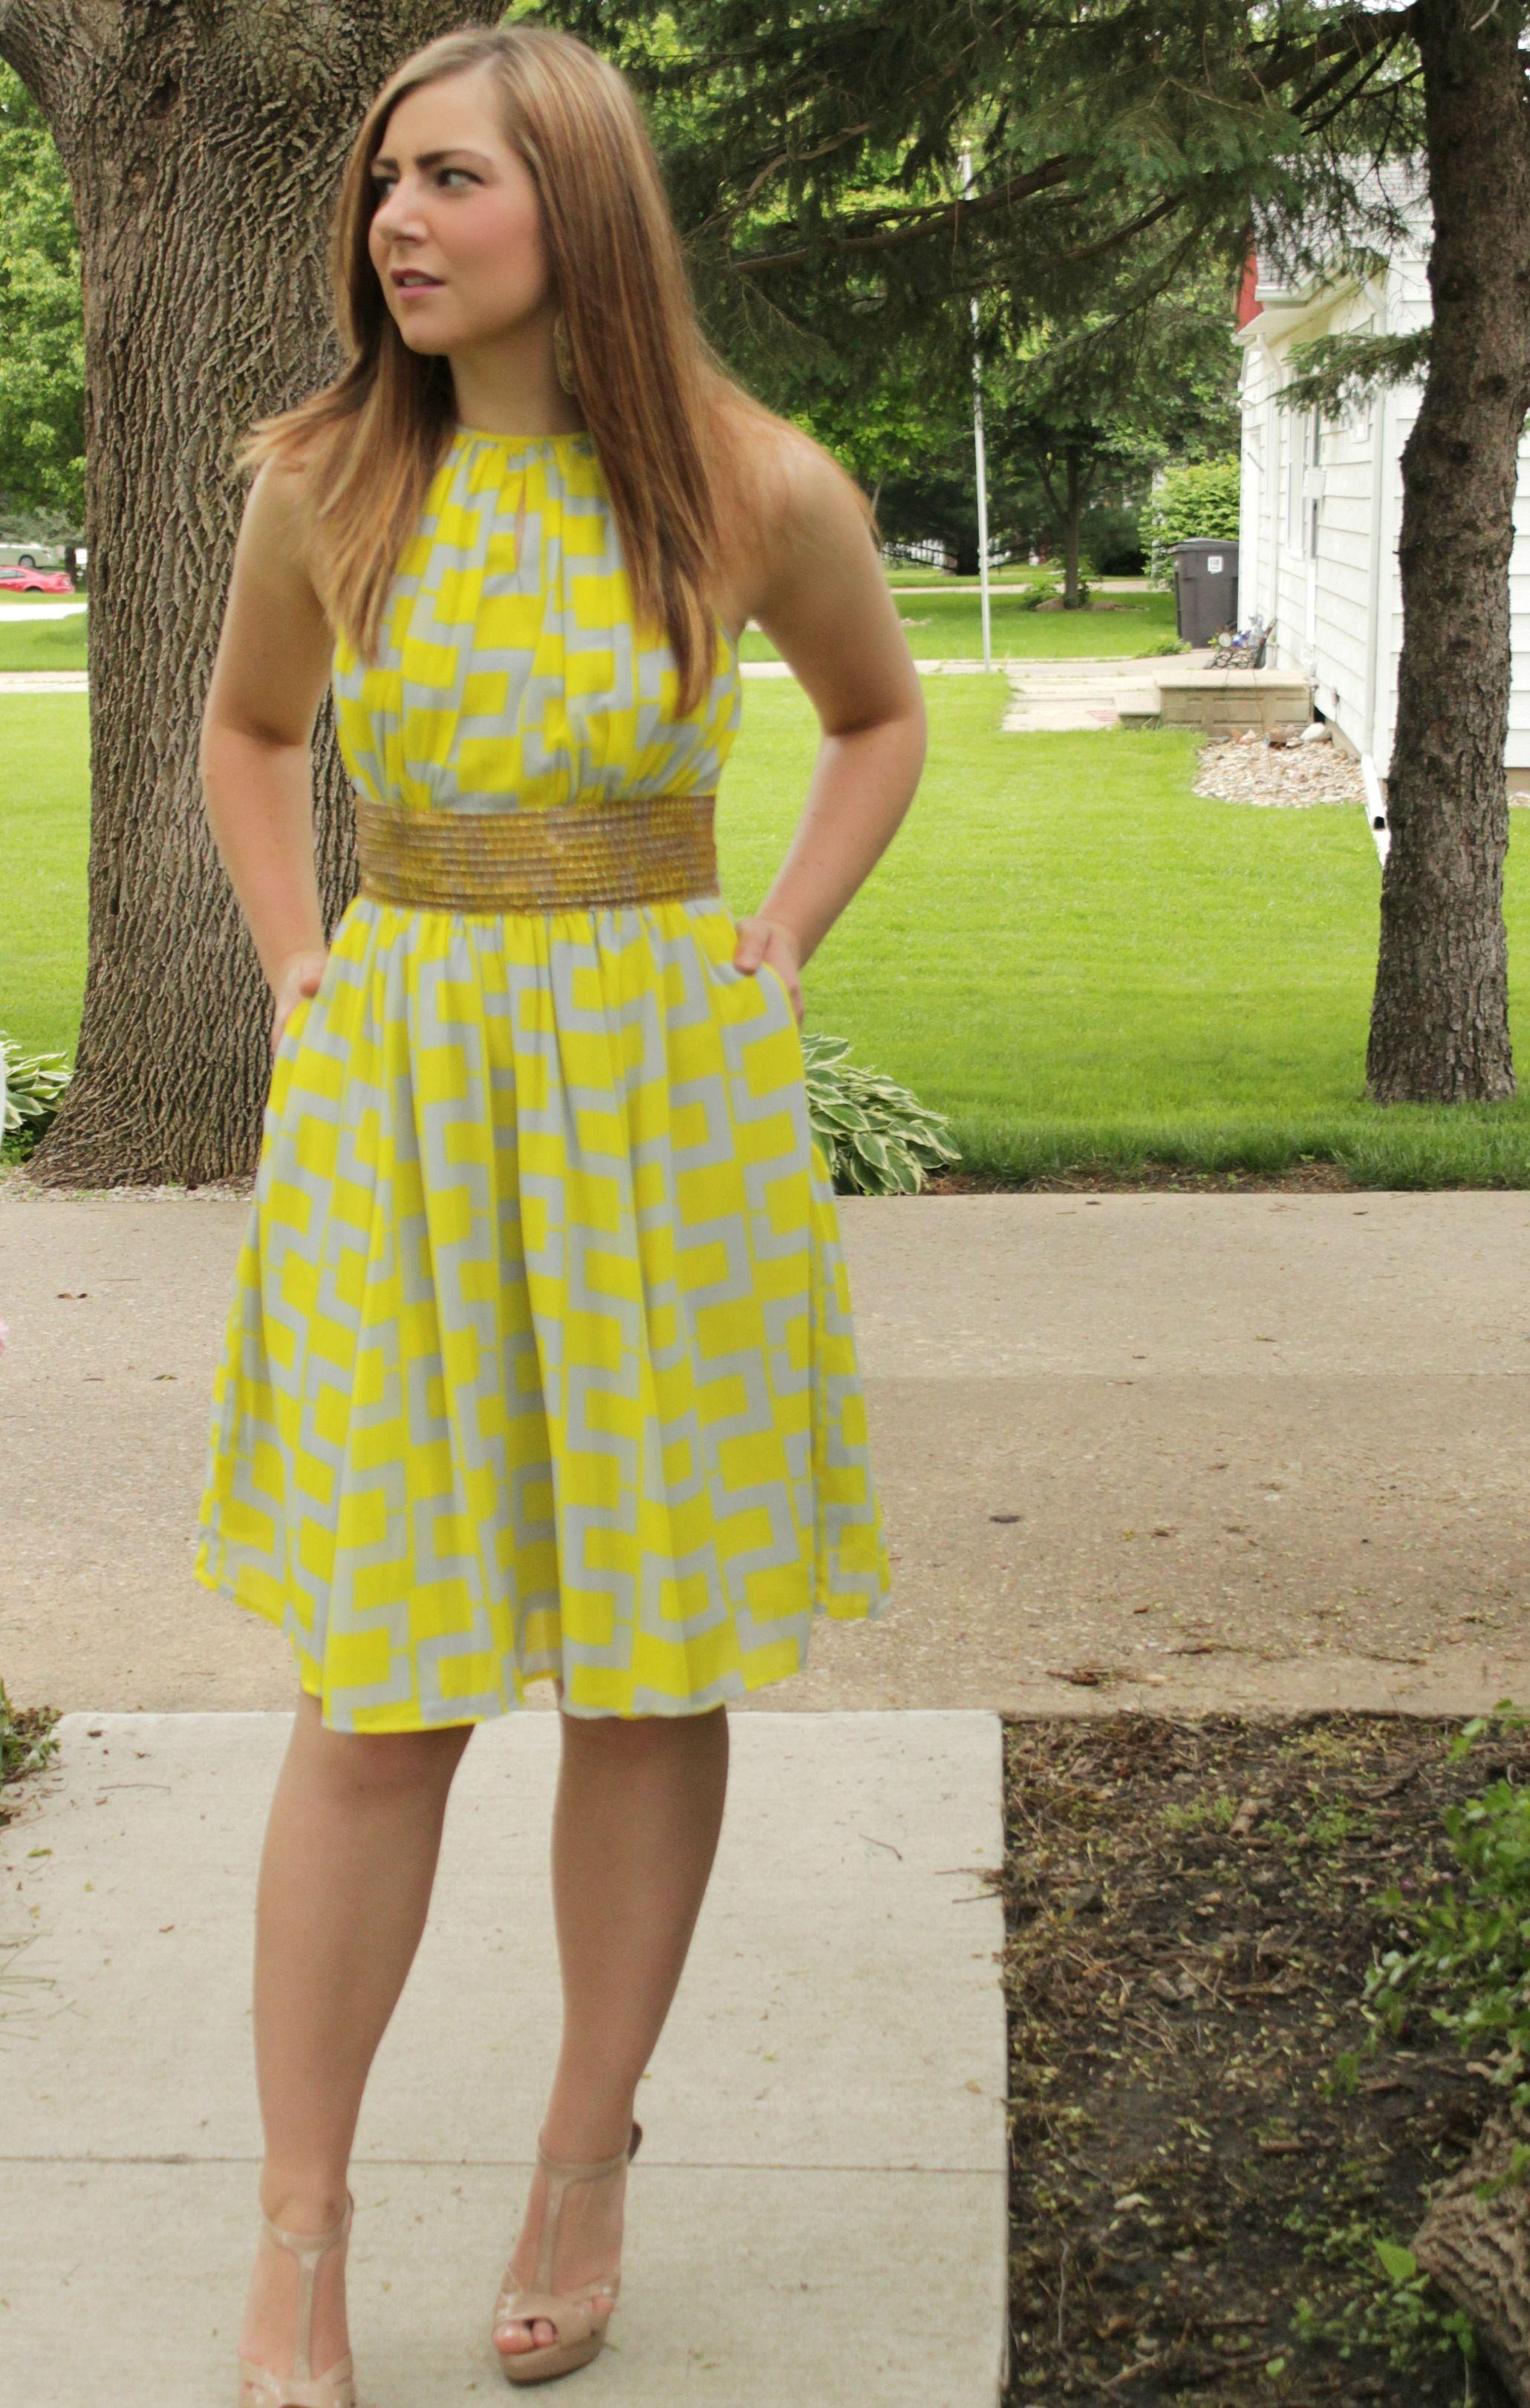 Bridal Shower Fun Rachel S Lookbook Dress To Impress Bridal Shower Dress Eshakti Dress [ 3242 x 2060 Pixel ]